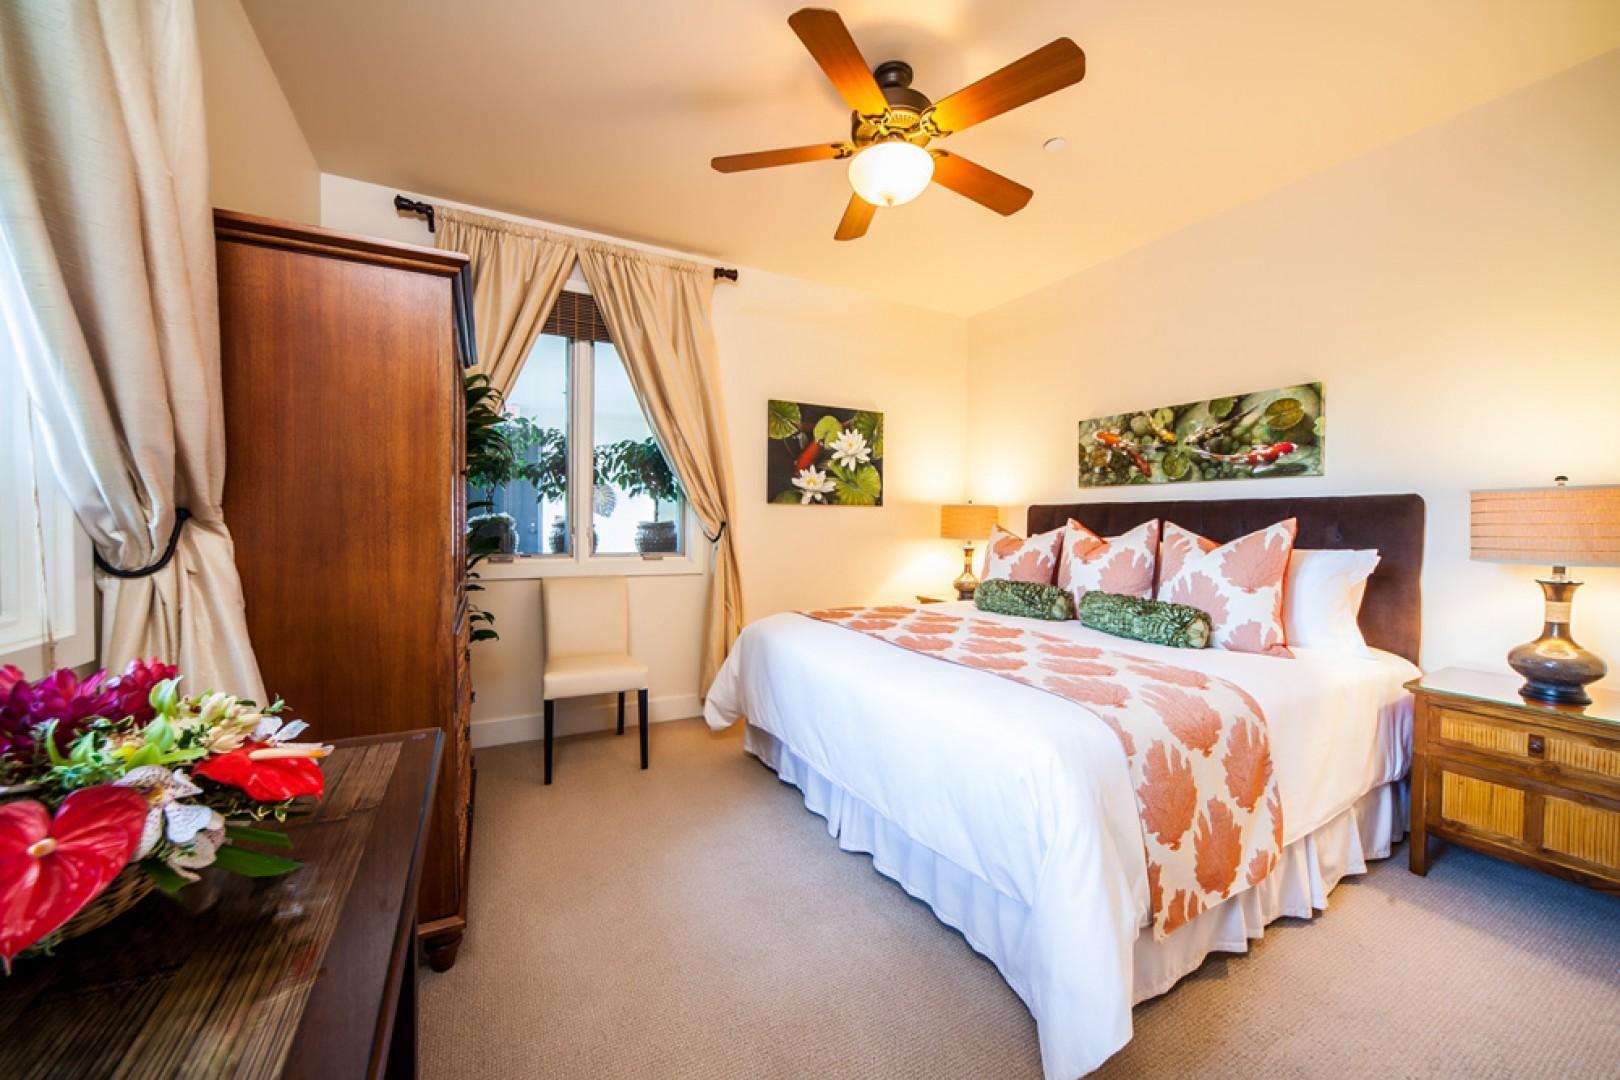 Blue Horizons K308 - Third Bedroom with King Bed, Adjacent Shower Bath, Desk, HDTV, HD Cable, CD/DVD